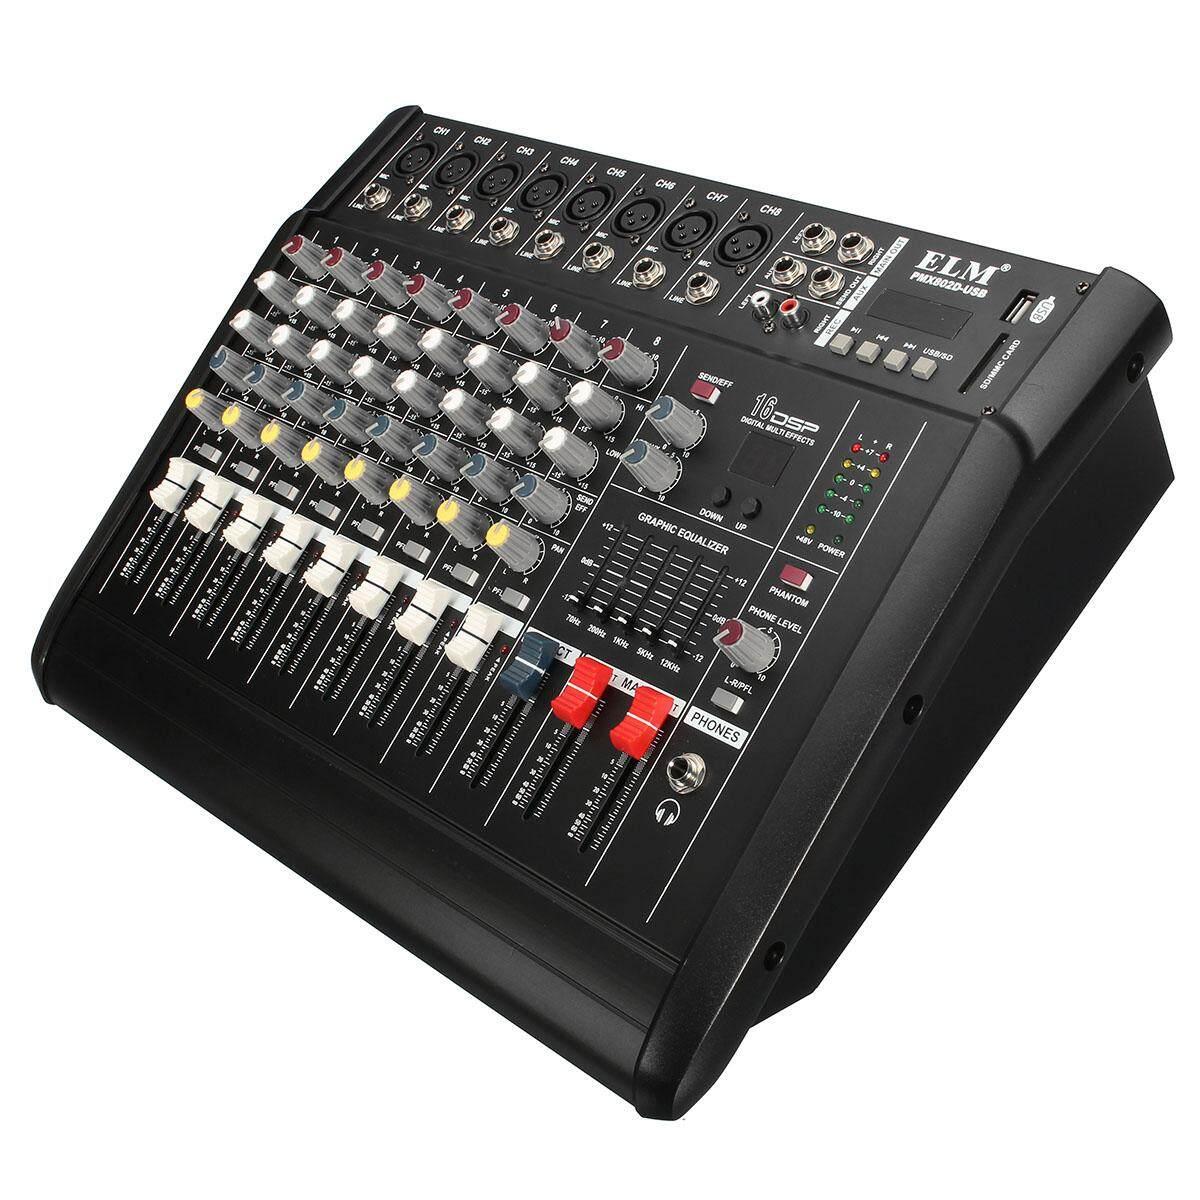 Claite El M PMX802D-USB 300 W 8 Channel DJ Karaoke KTV Profesional Mixing Console Mixer Amplifier-Internasional